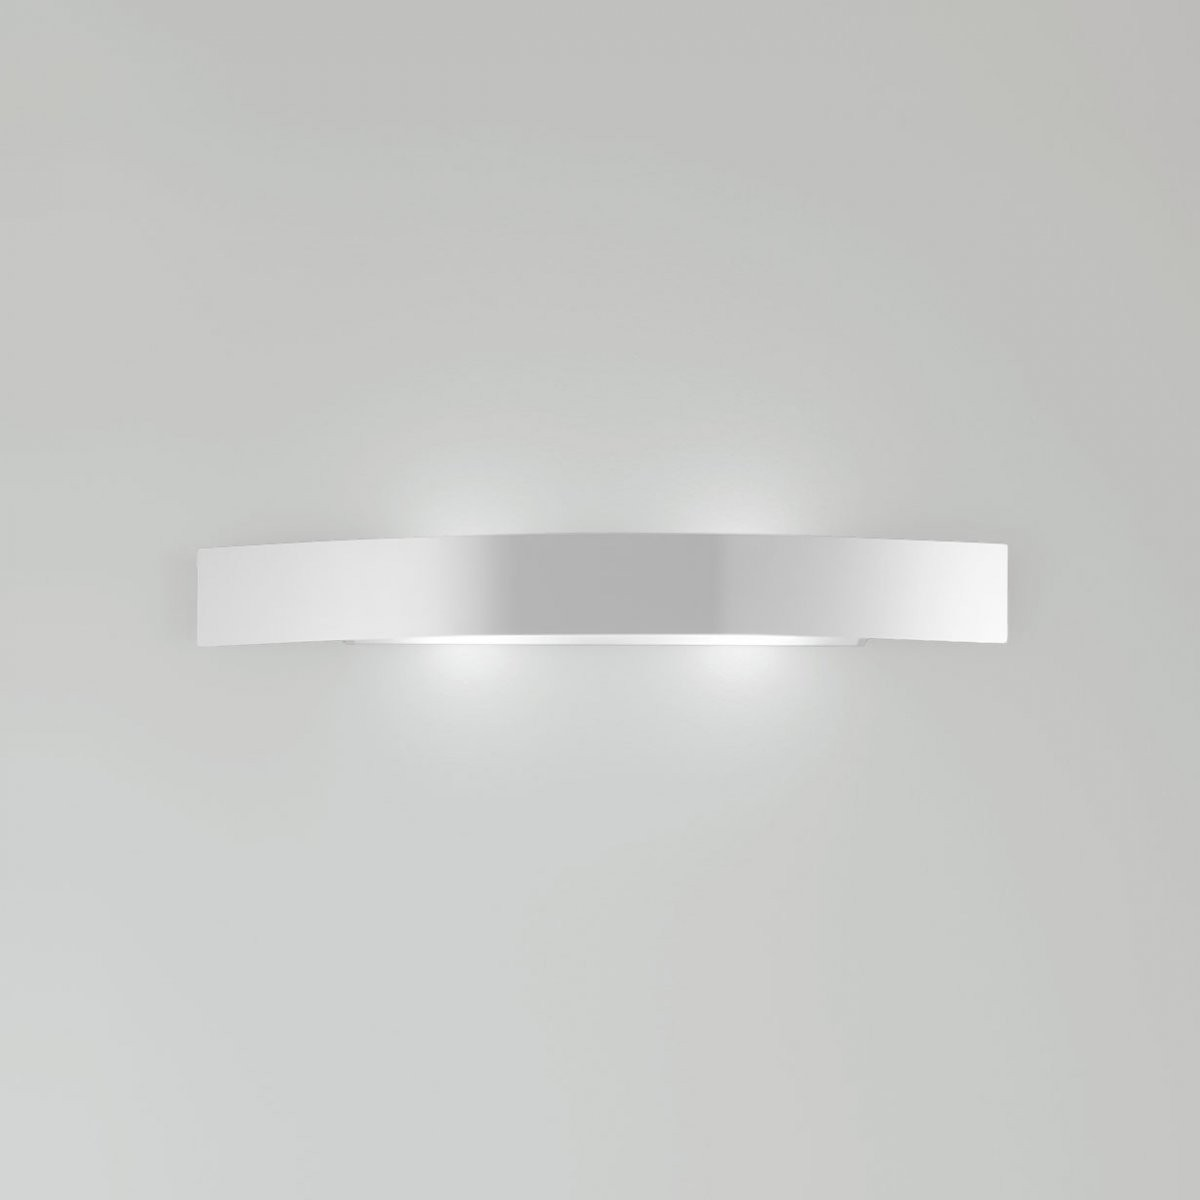 Fontanaarte riga 70 white wall lamp outlet for Fontana arte riga